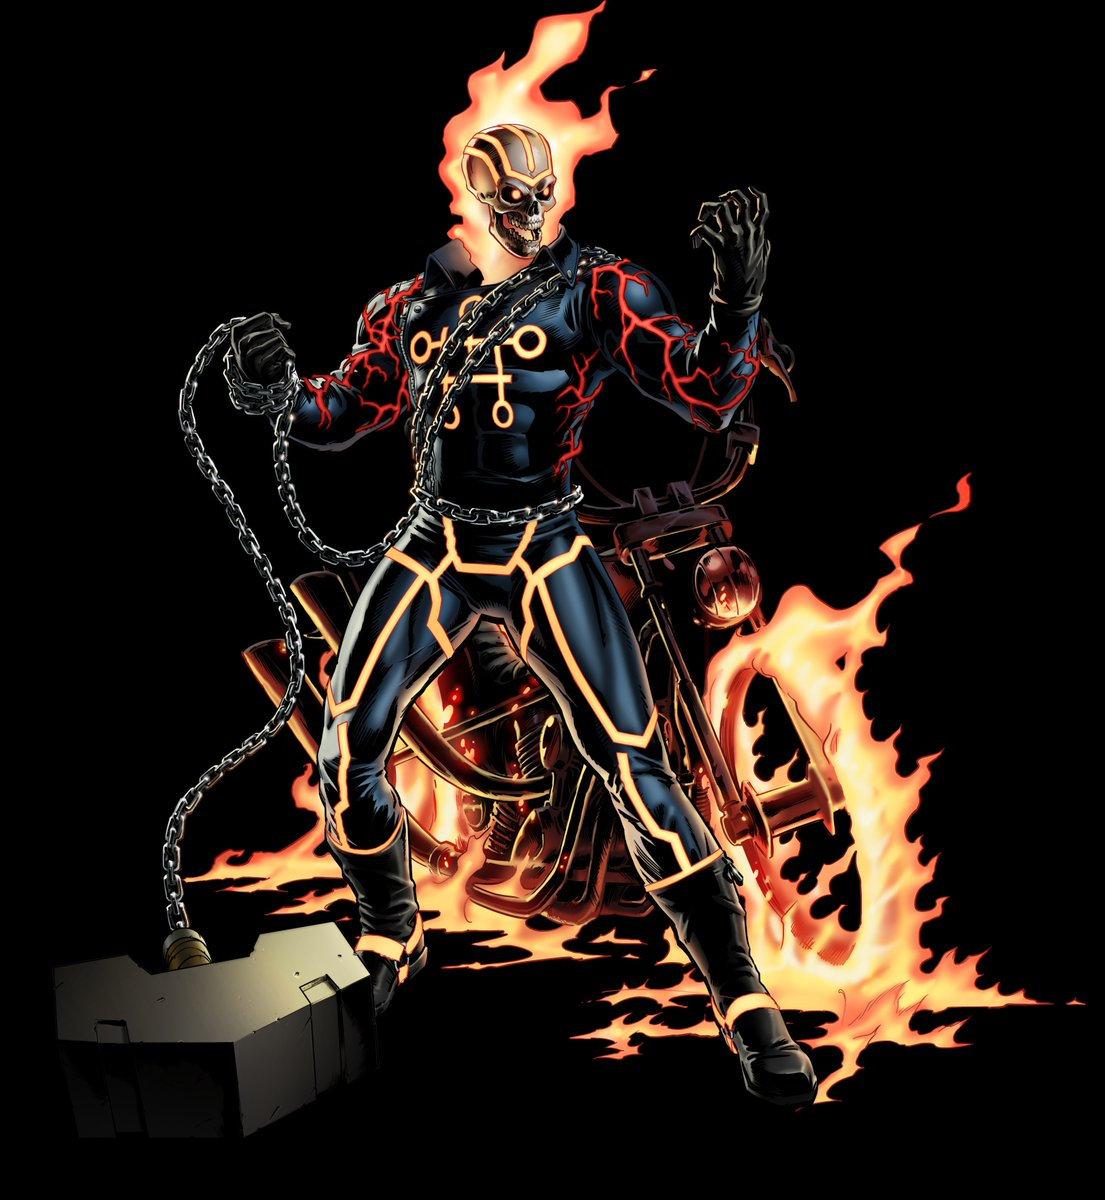 Champions (Earth-616) | Spider-Man Wiki | Fandom